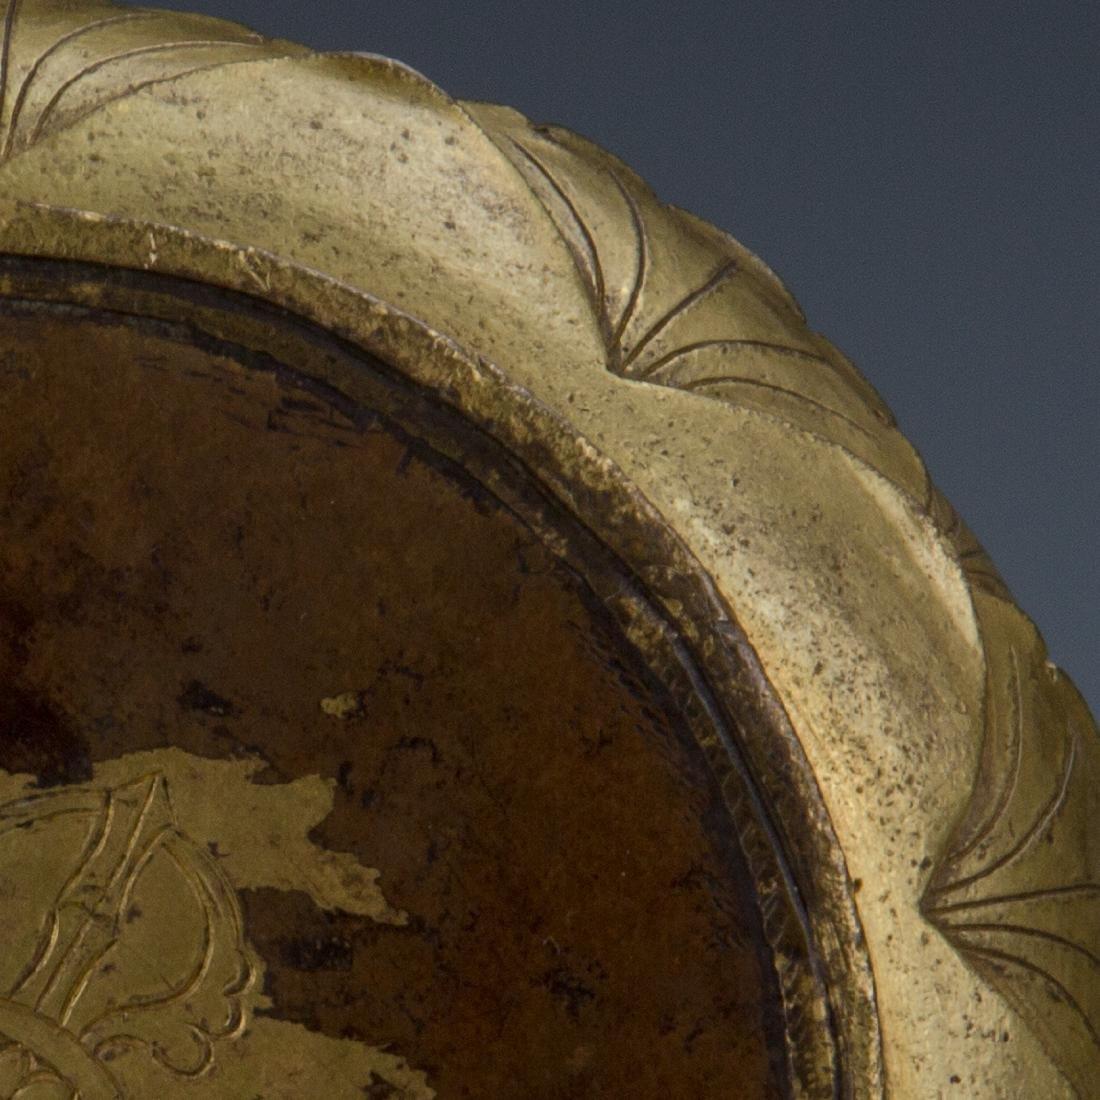 Rare Gilt Bronze Seated Buddha on a Rounded Lotus Base - 6